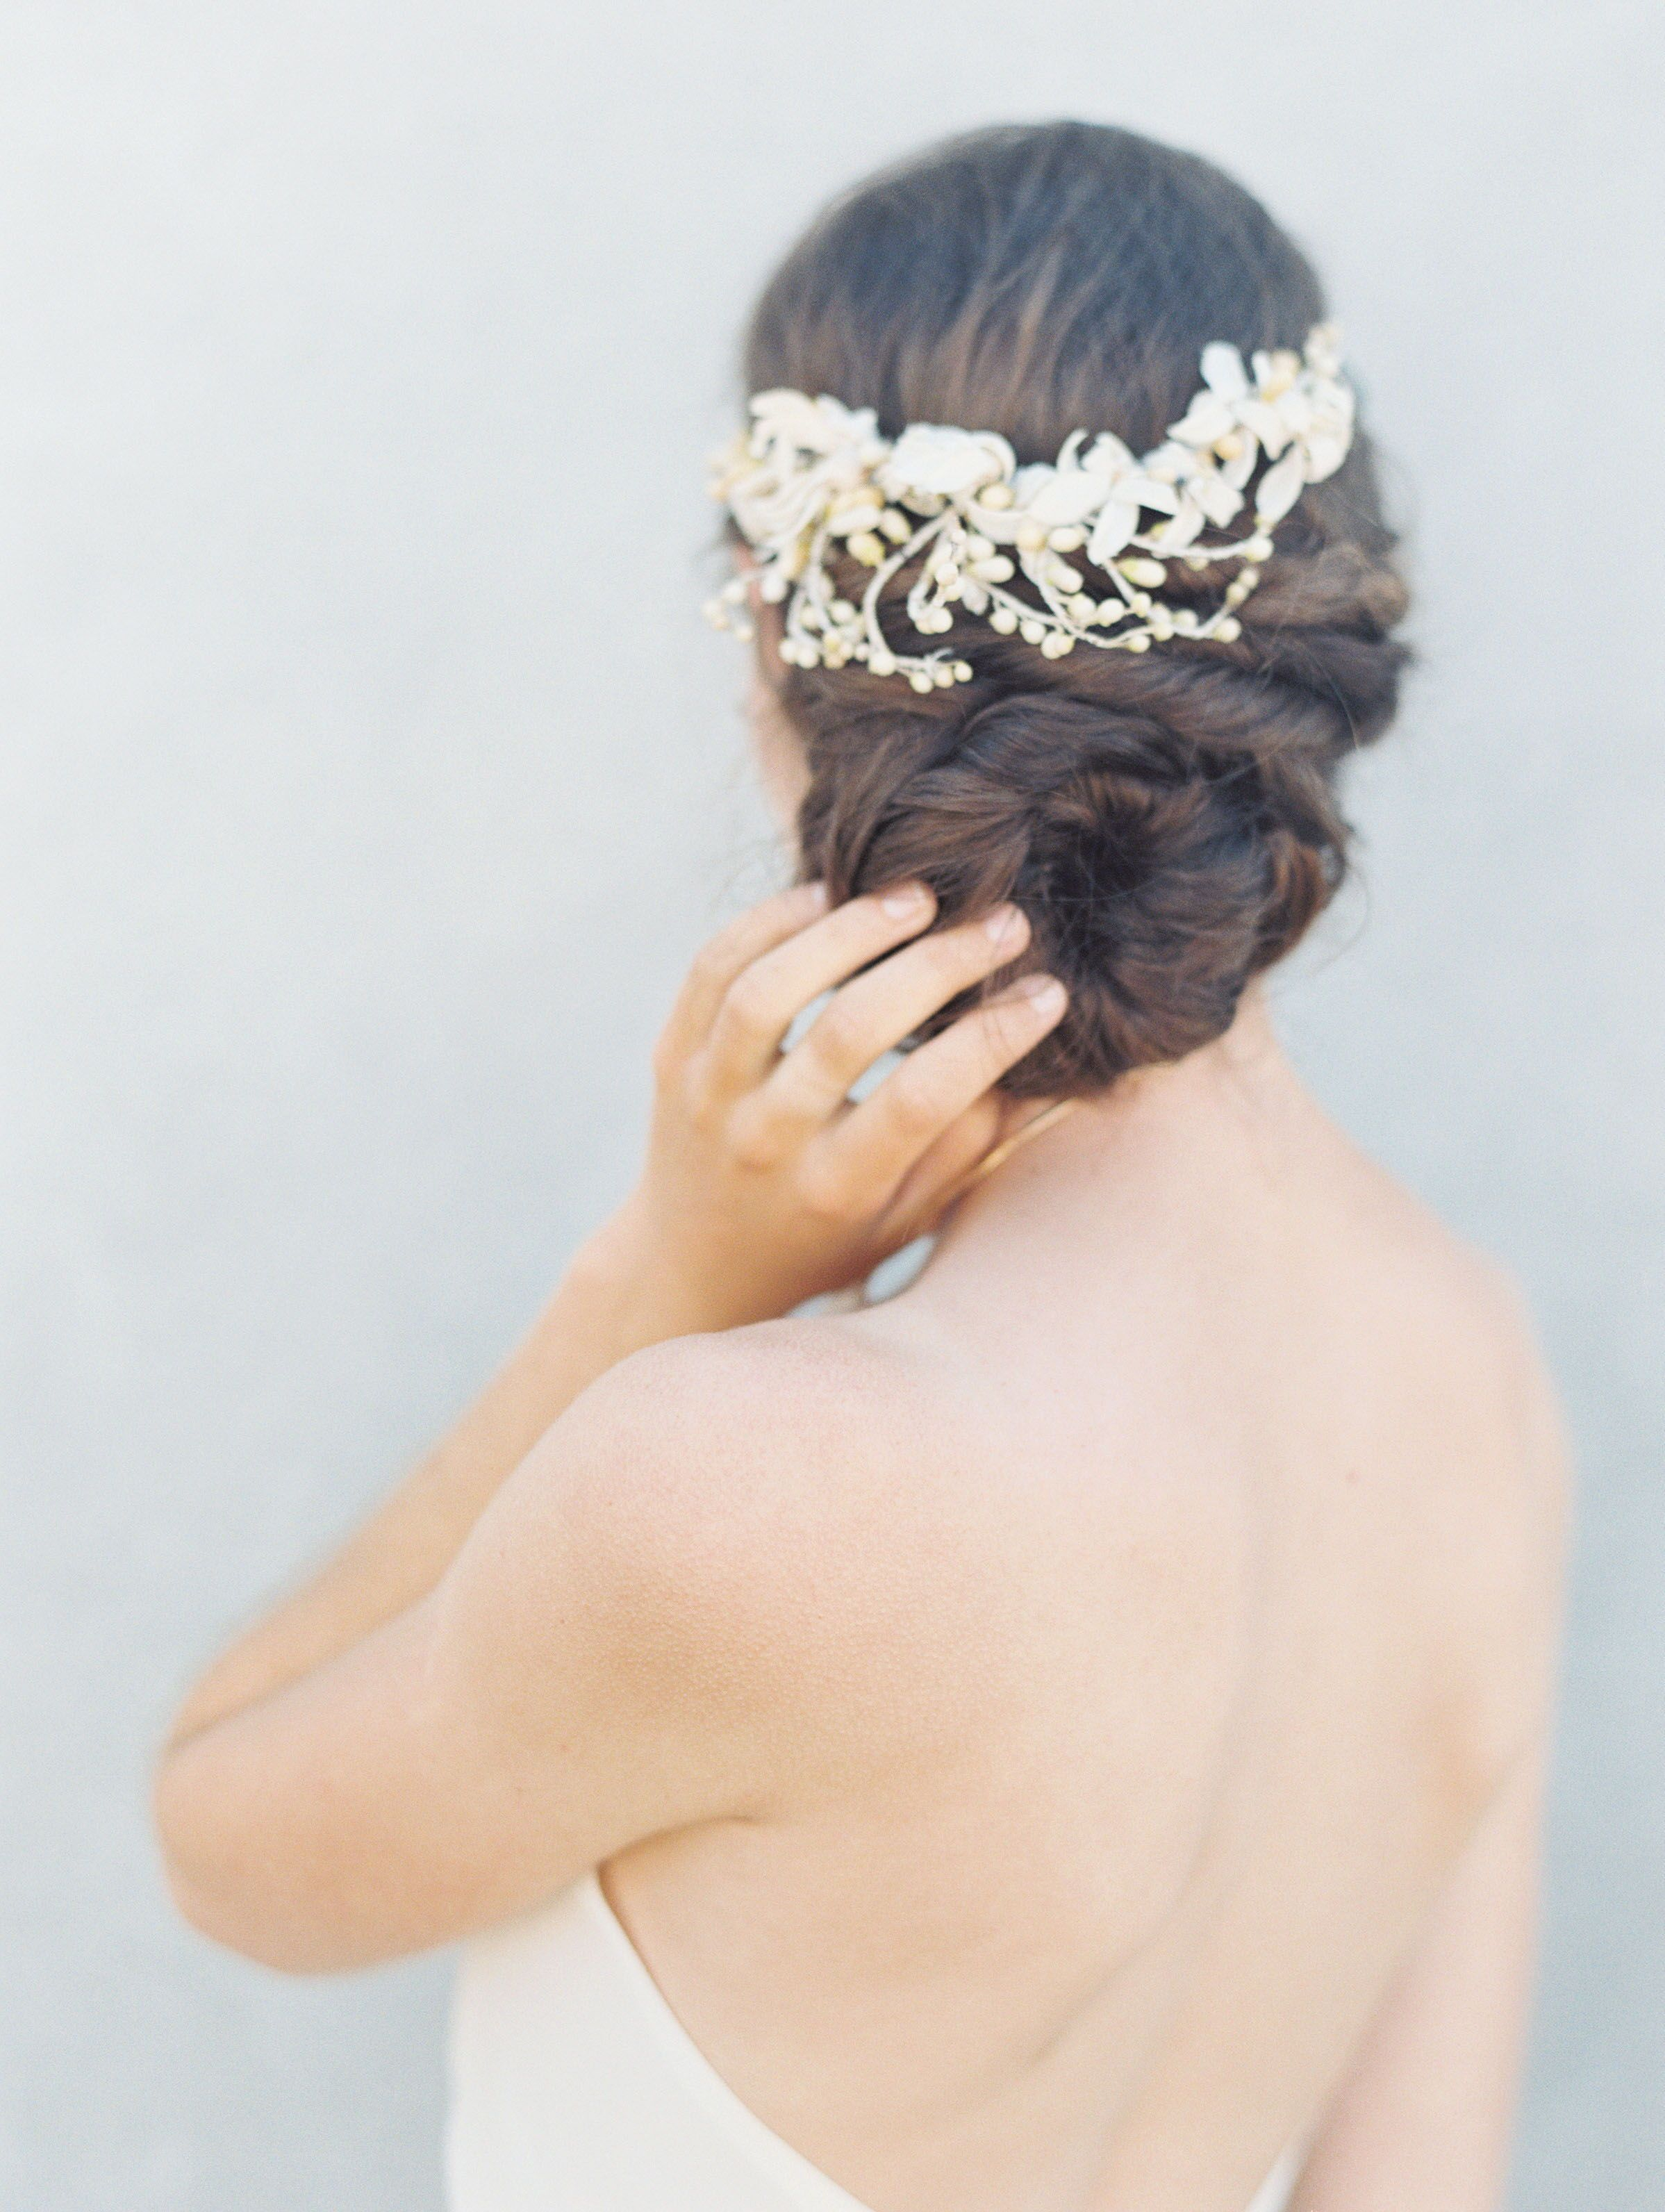 cornish coastal wedding | cornwall, england | styling